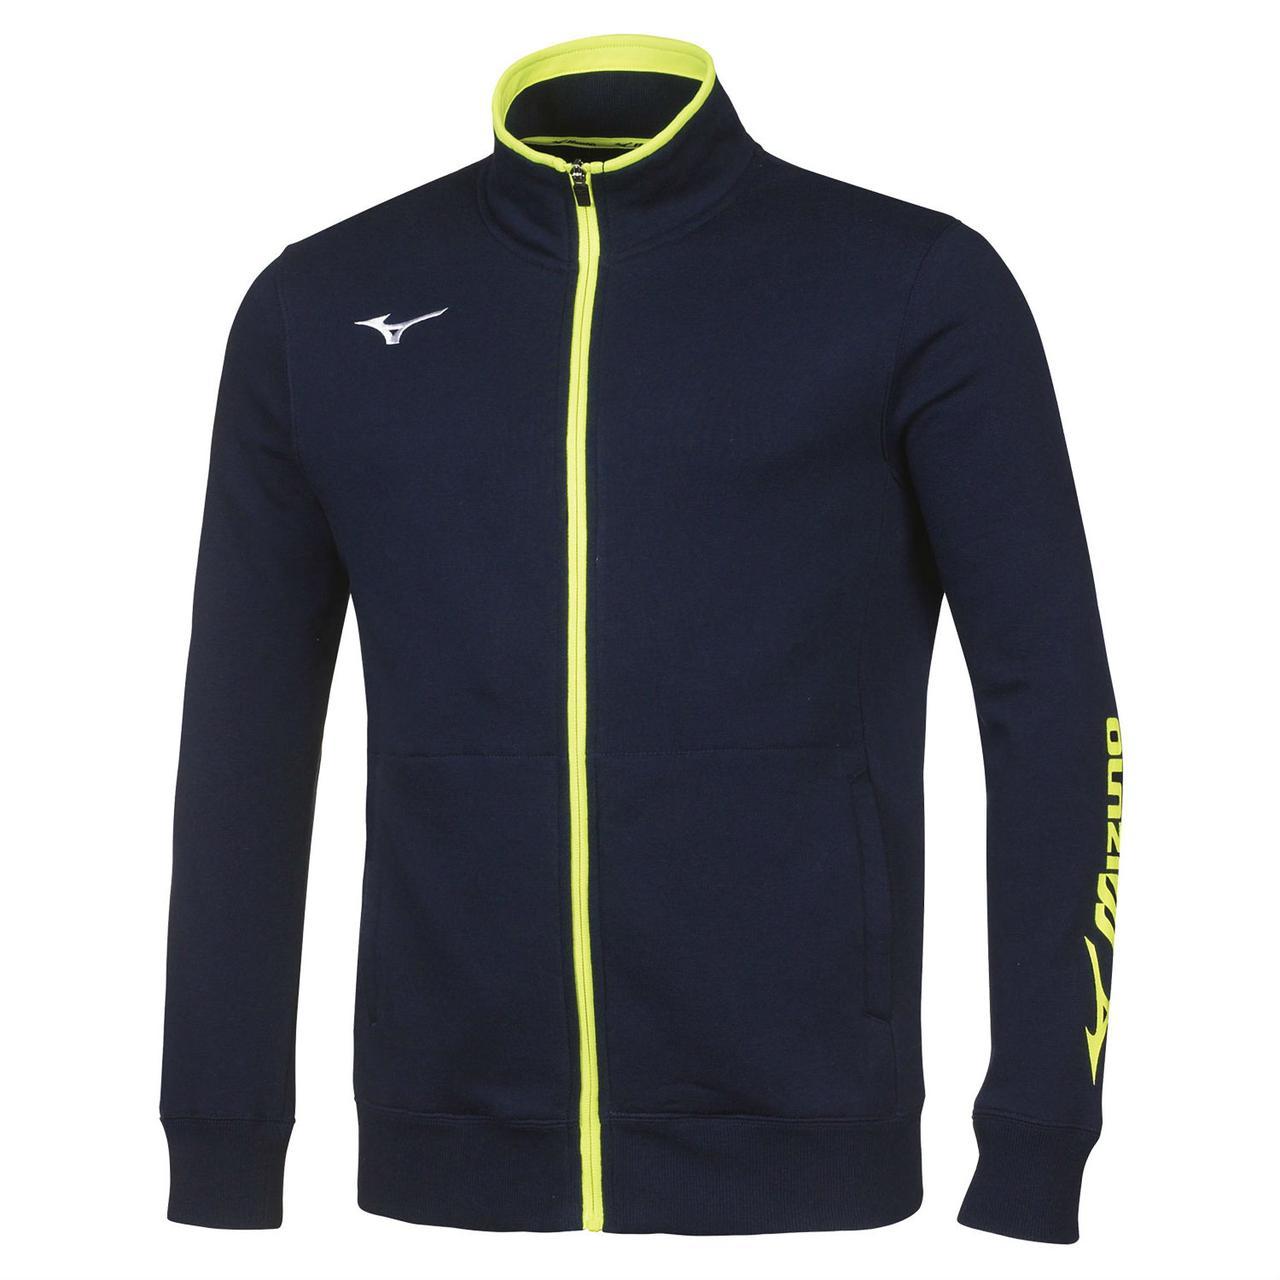 Толстовка Mizuno Sweat Fz Jacket (32EC7009-14)